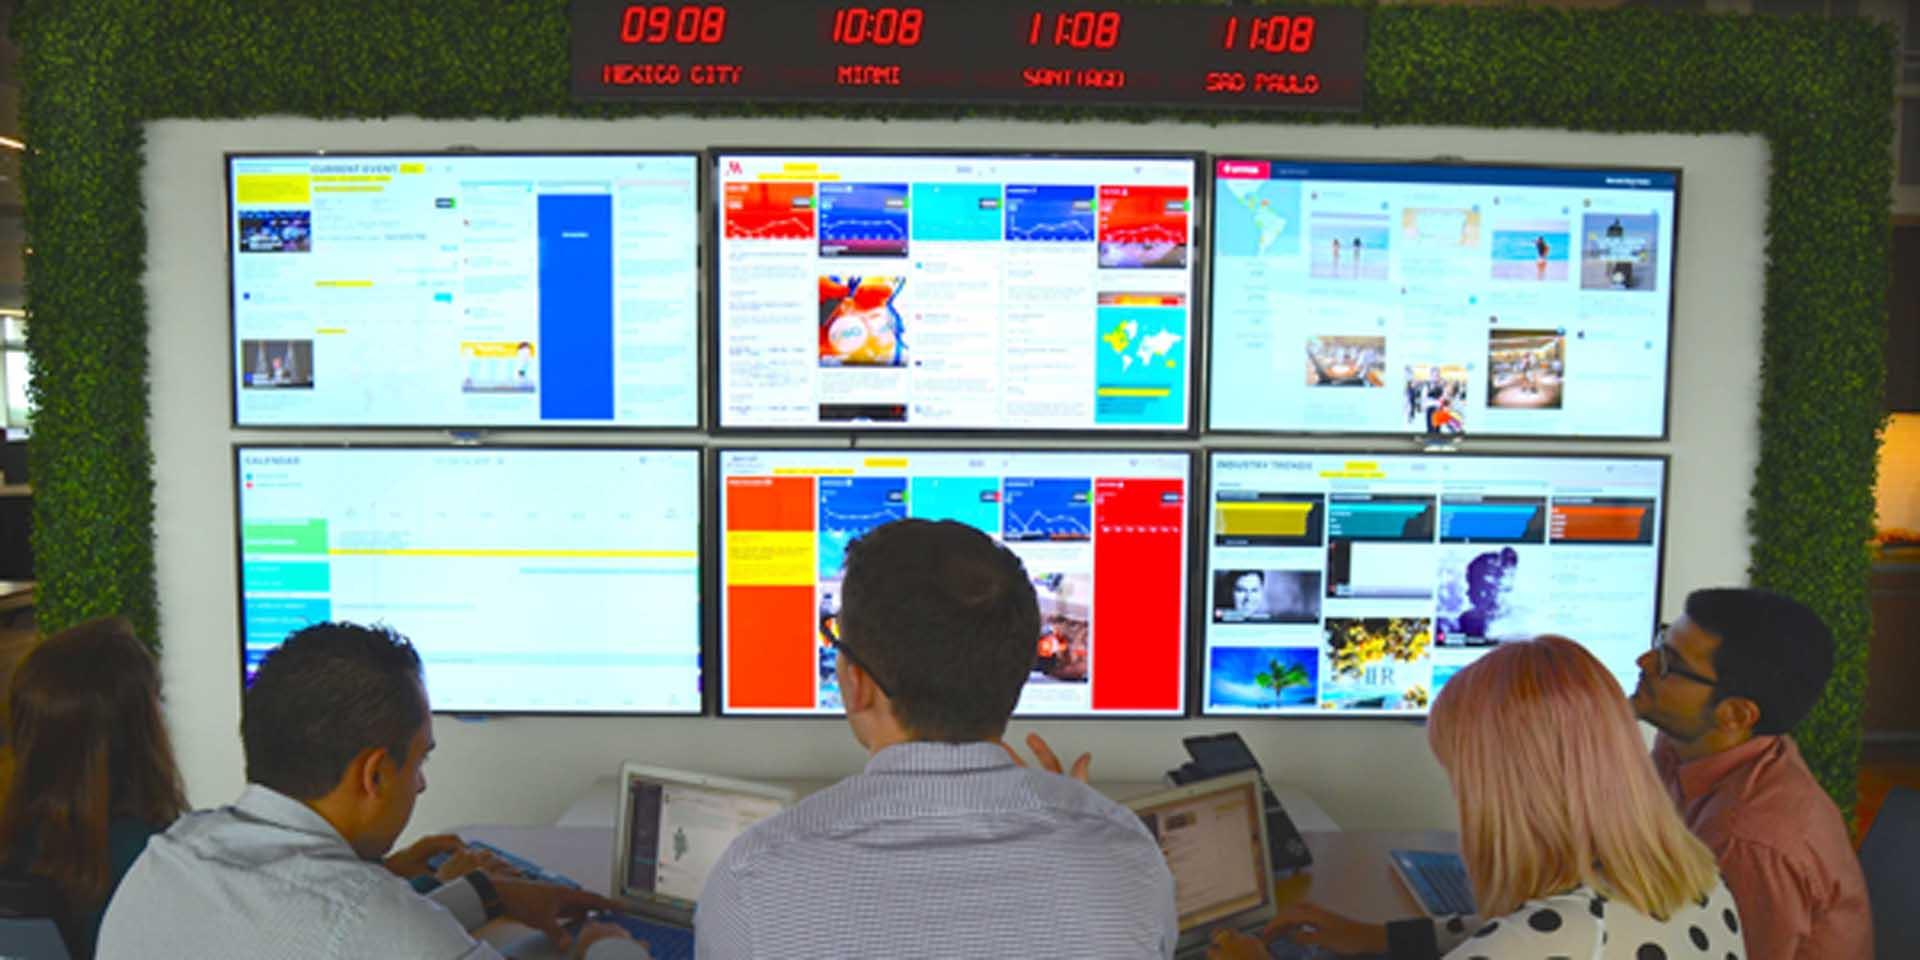 Wnętrze siedziby MLive, Floryda. Źródło: http://news.marriott.com/2016/04/marriott-international-launches-third-m-live-studio-companys-global-marketing-real-time-command-center/